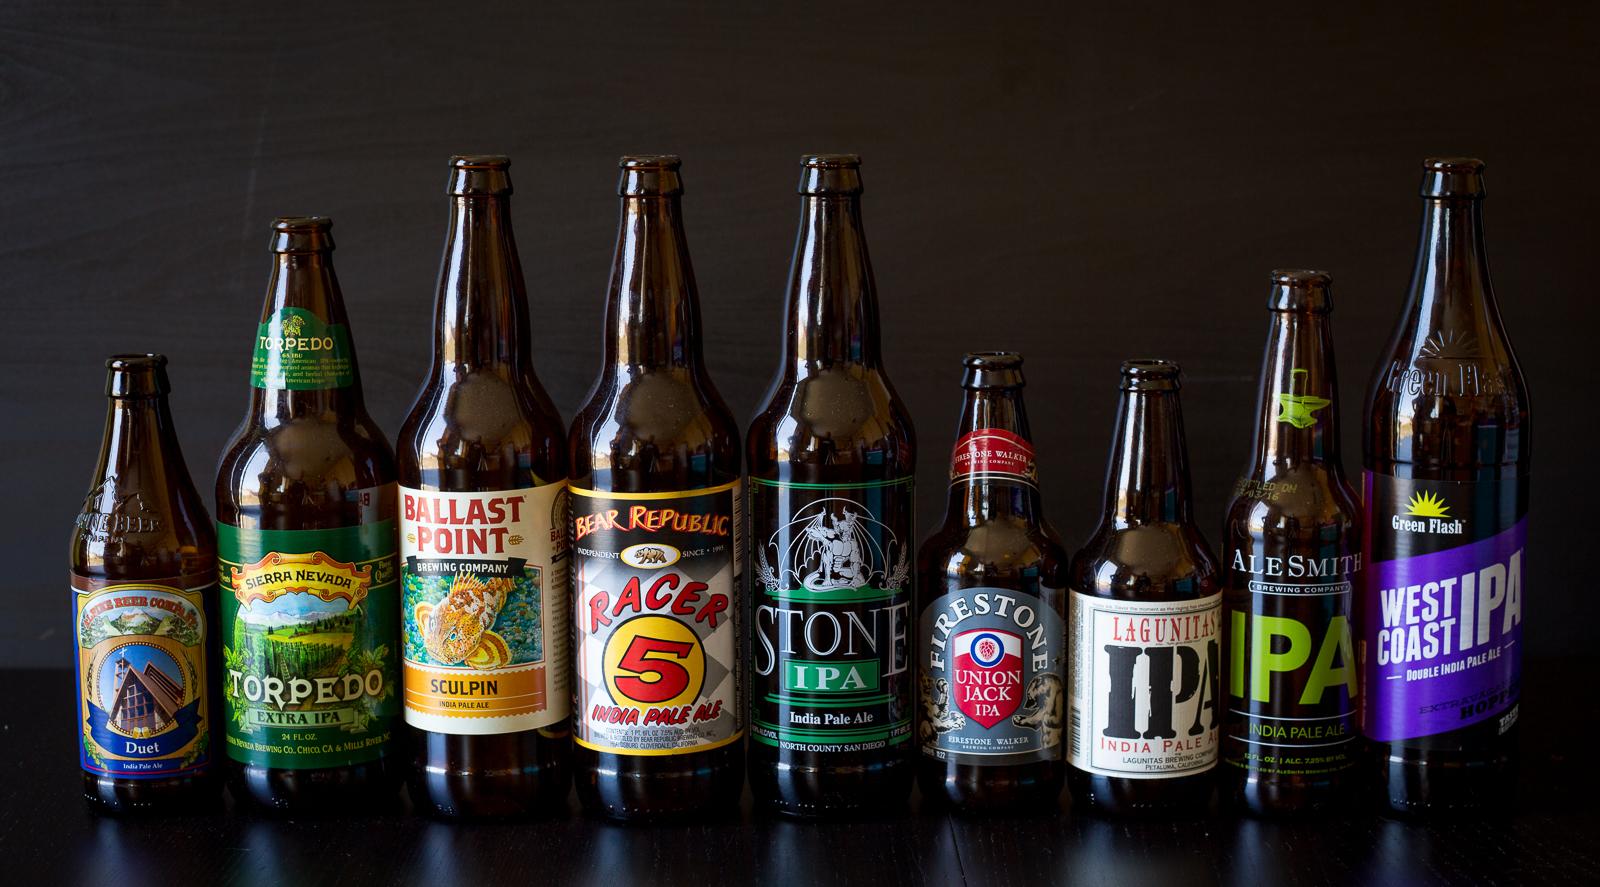 California Craft Beer Co